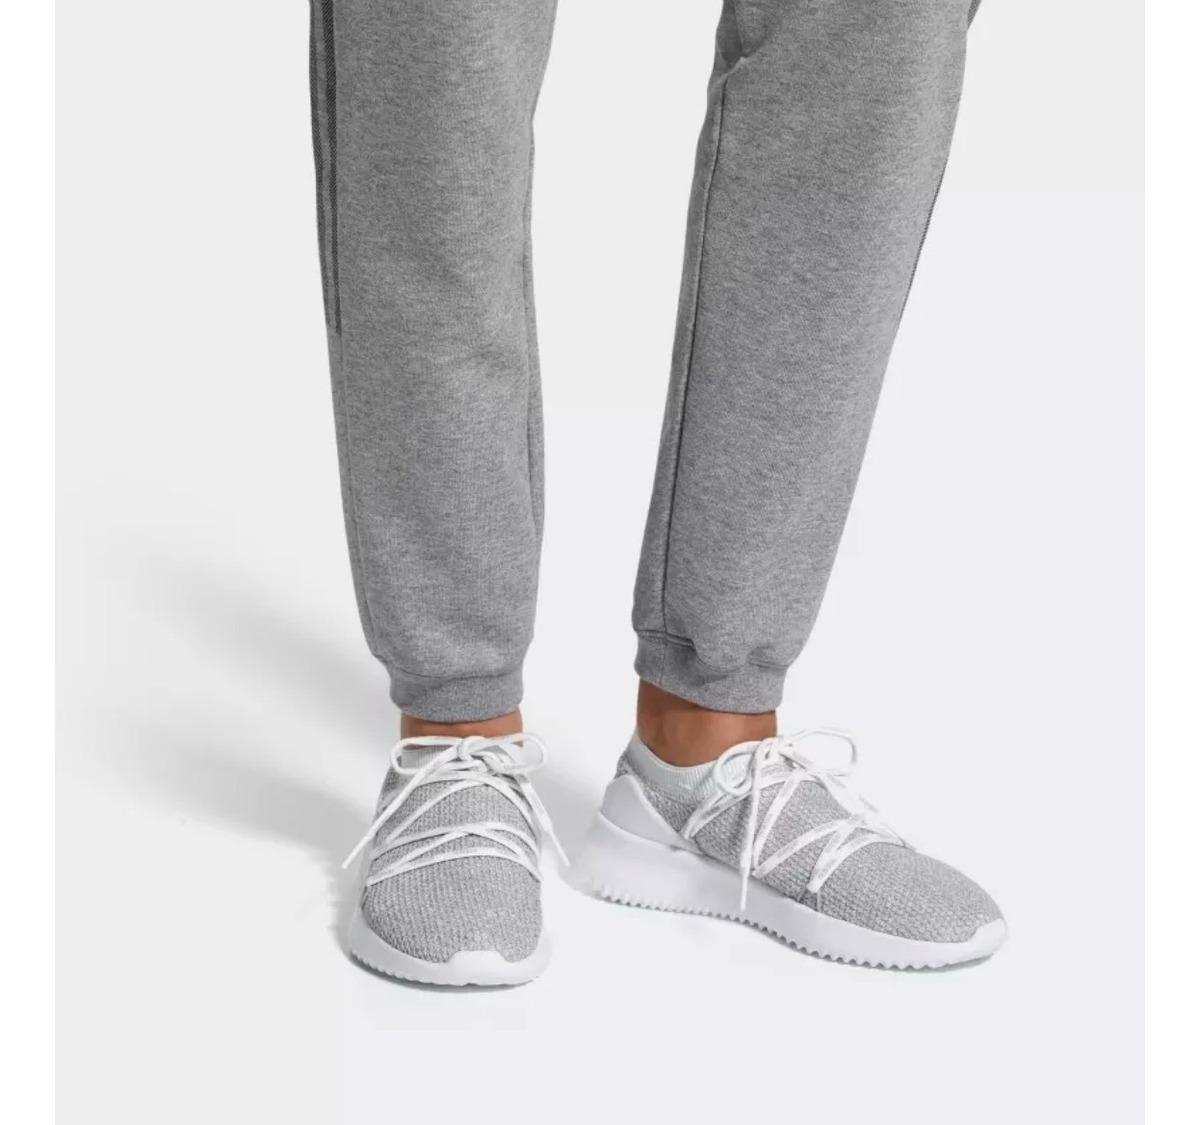 Zapatillas adidas Urbanas Ultimamotion W Mujer Calce Medias